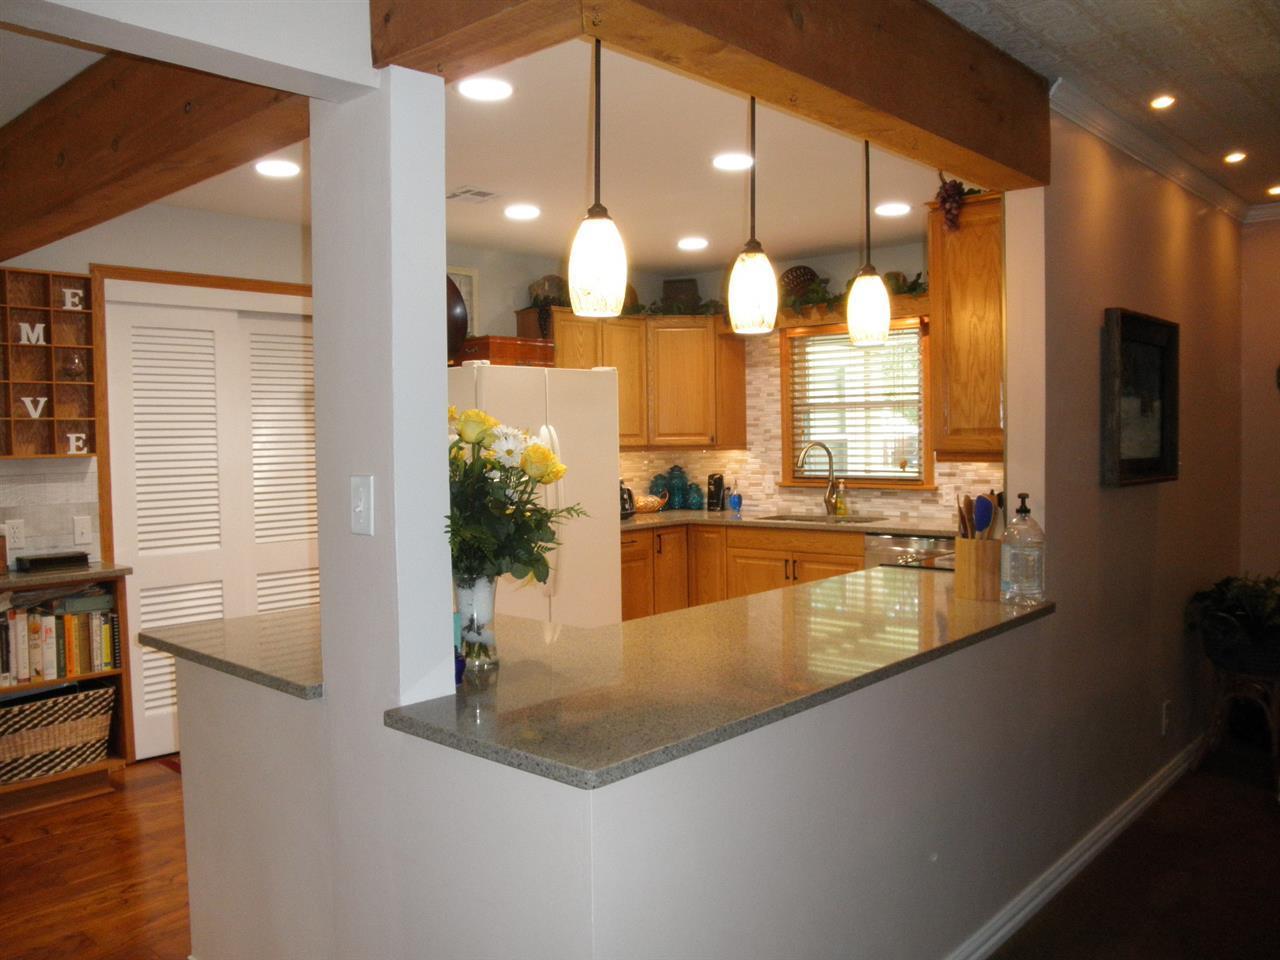 Sold Cross Sale W/ MLS | 127 Fairview  Ponca City, OK 74601 15